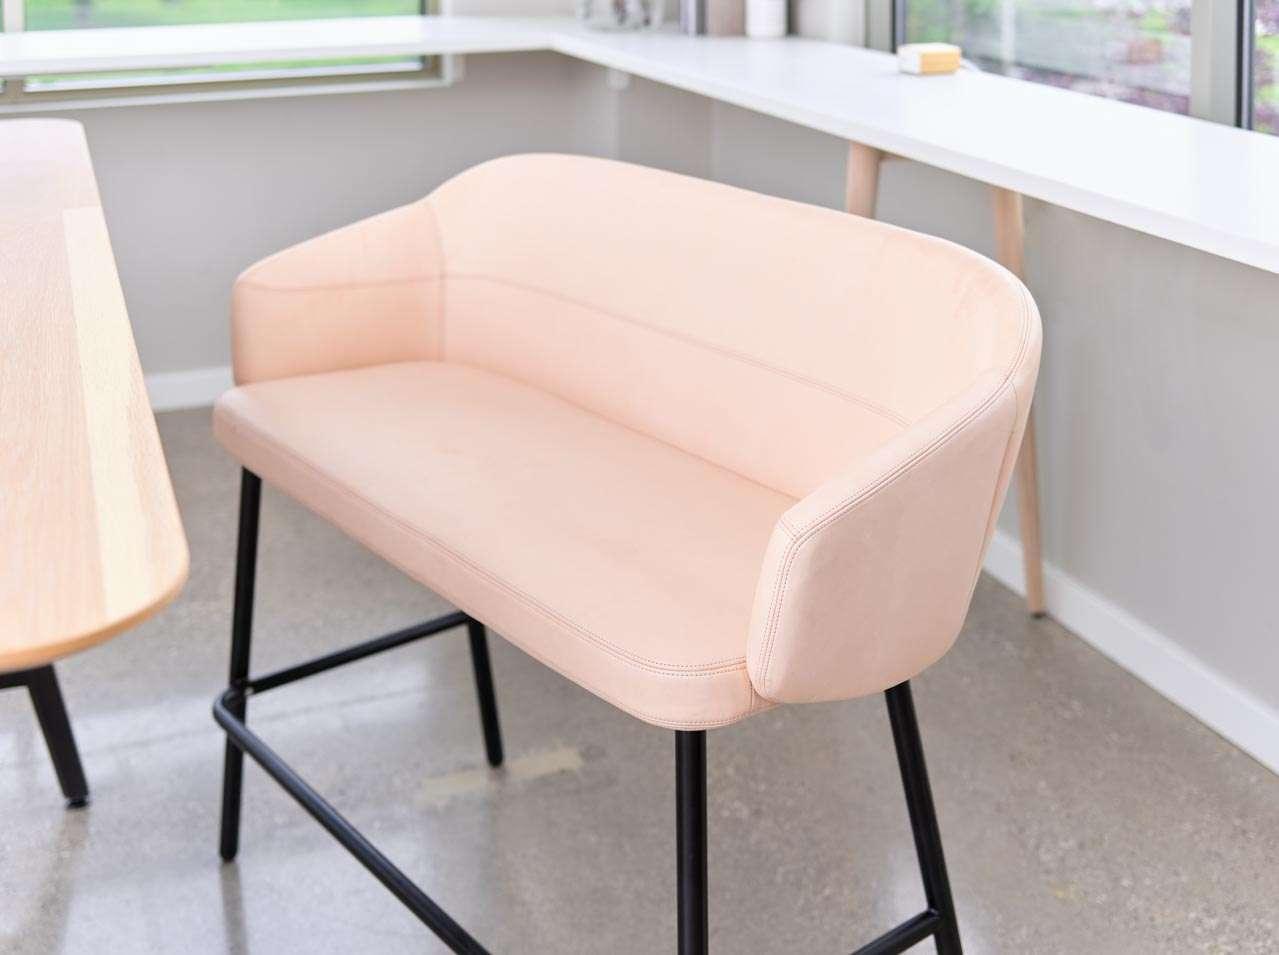 Seating: OFS Kasura